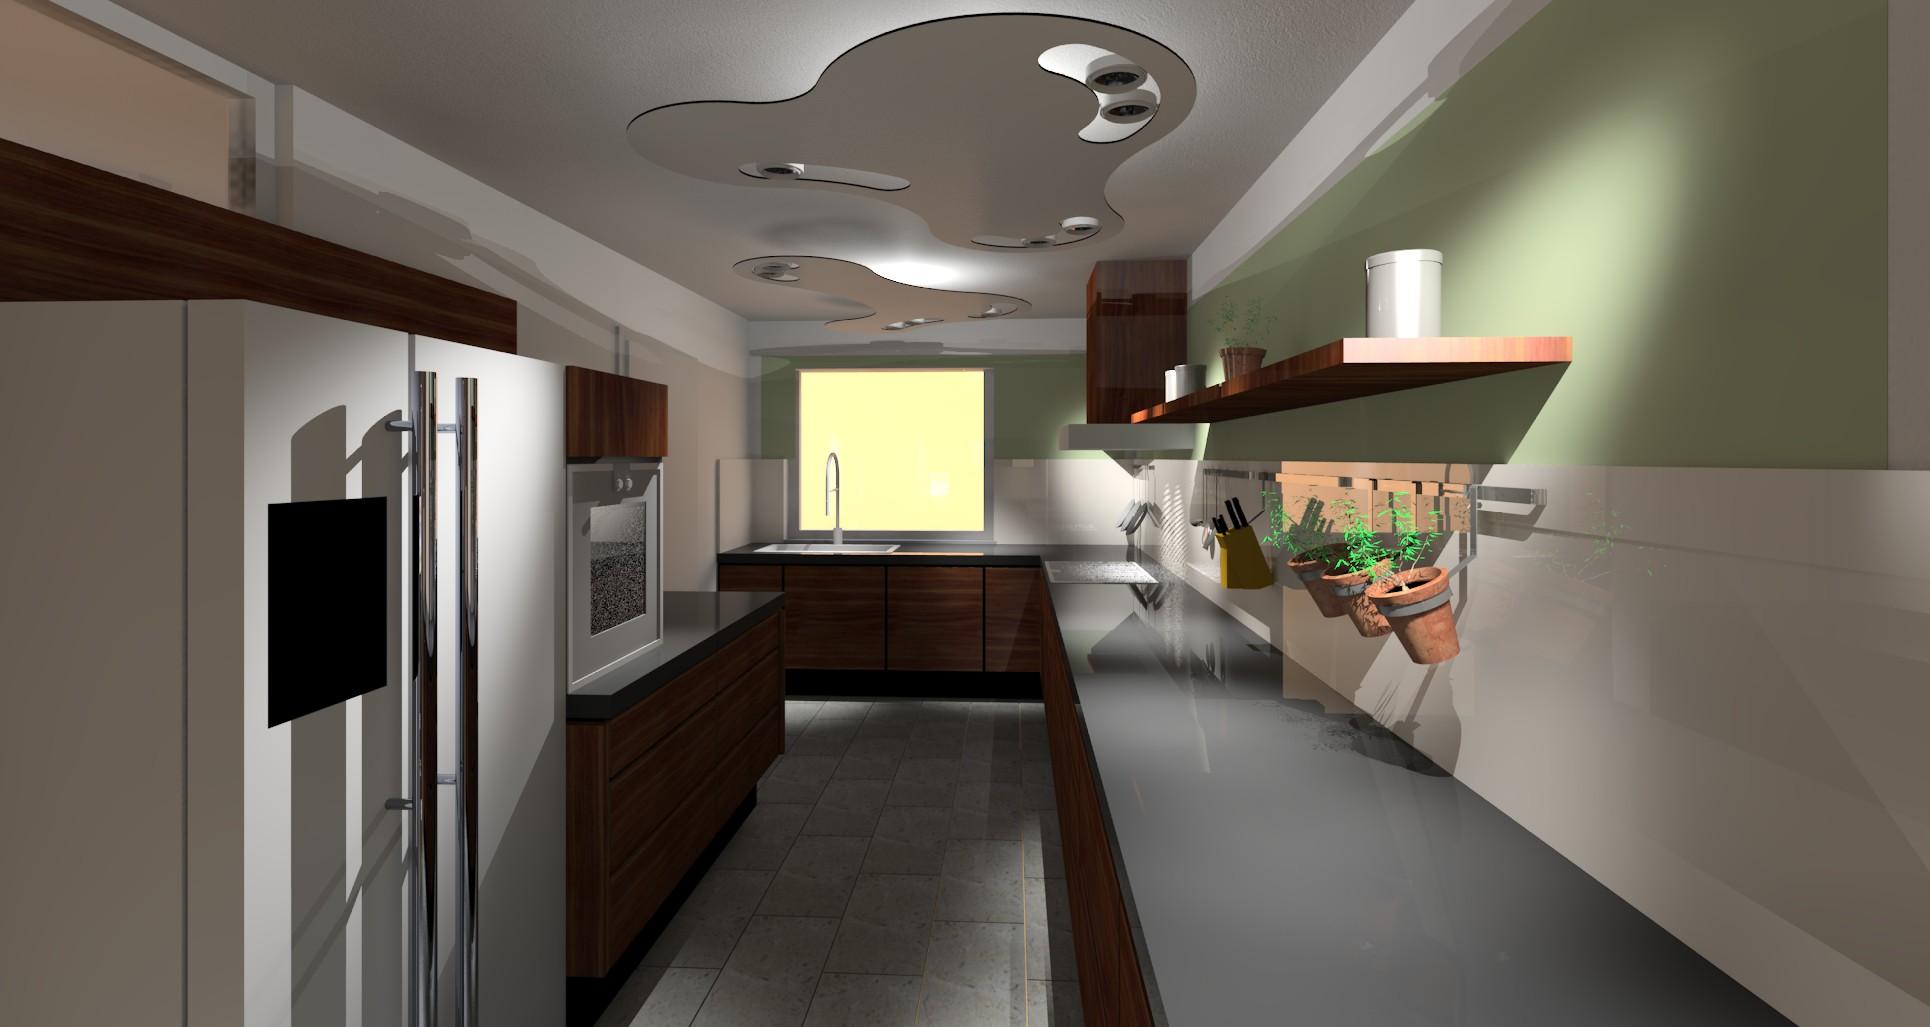 Küche - Planung